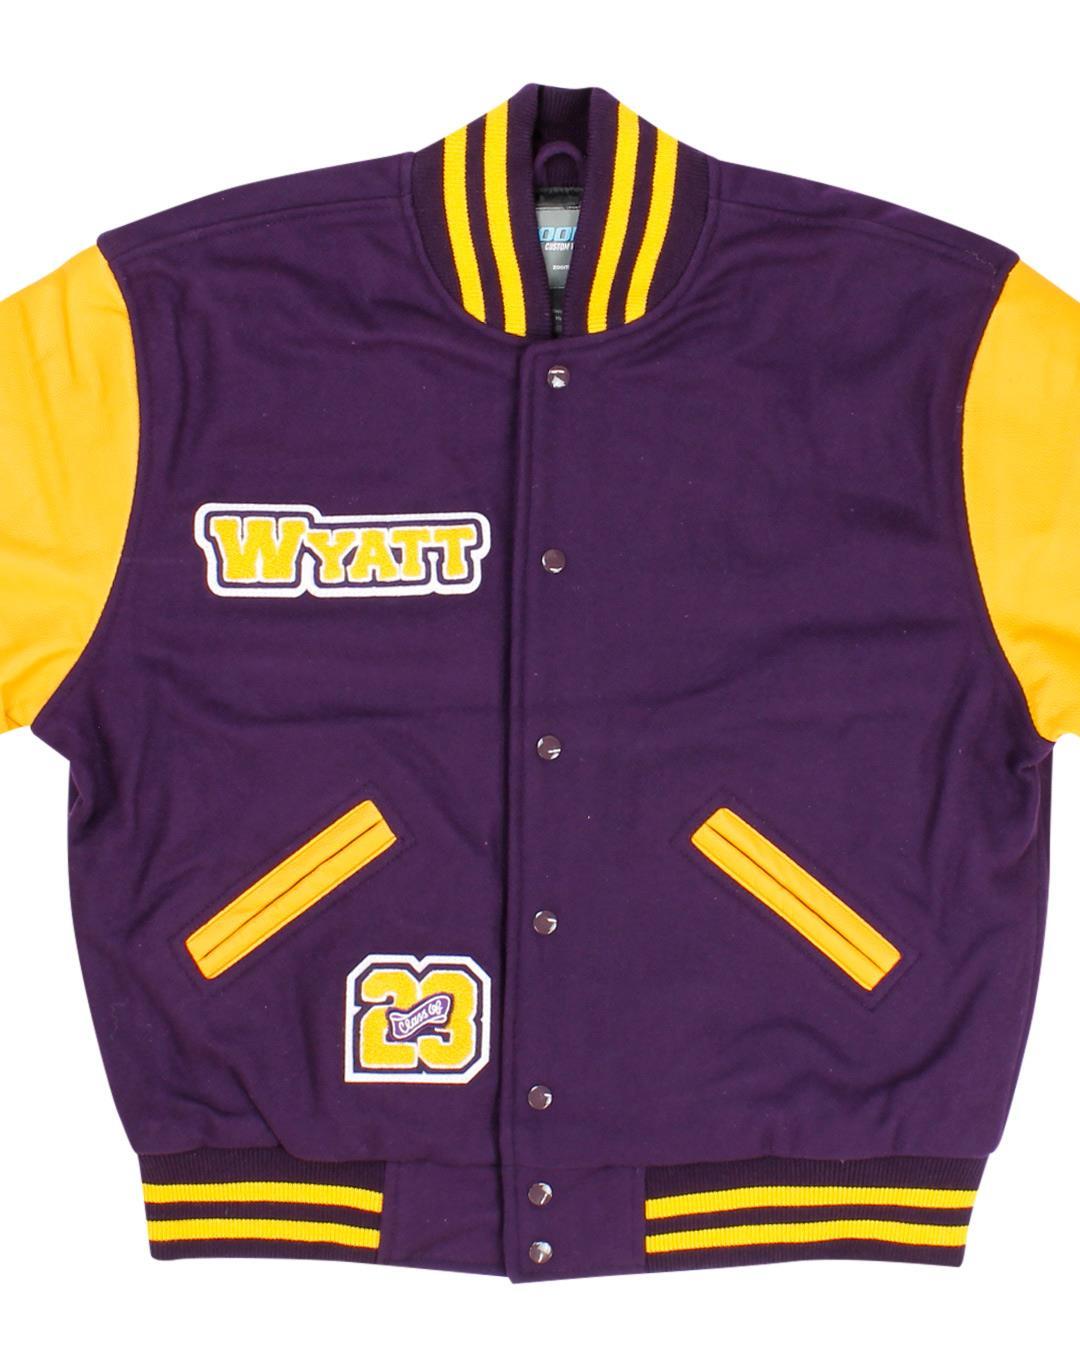 West Grand High School Letterman Jacket, Kremmling CO